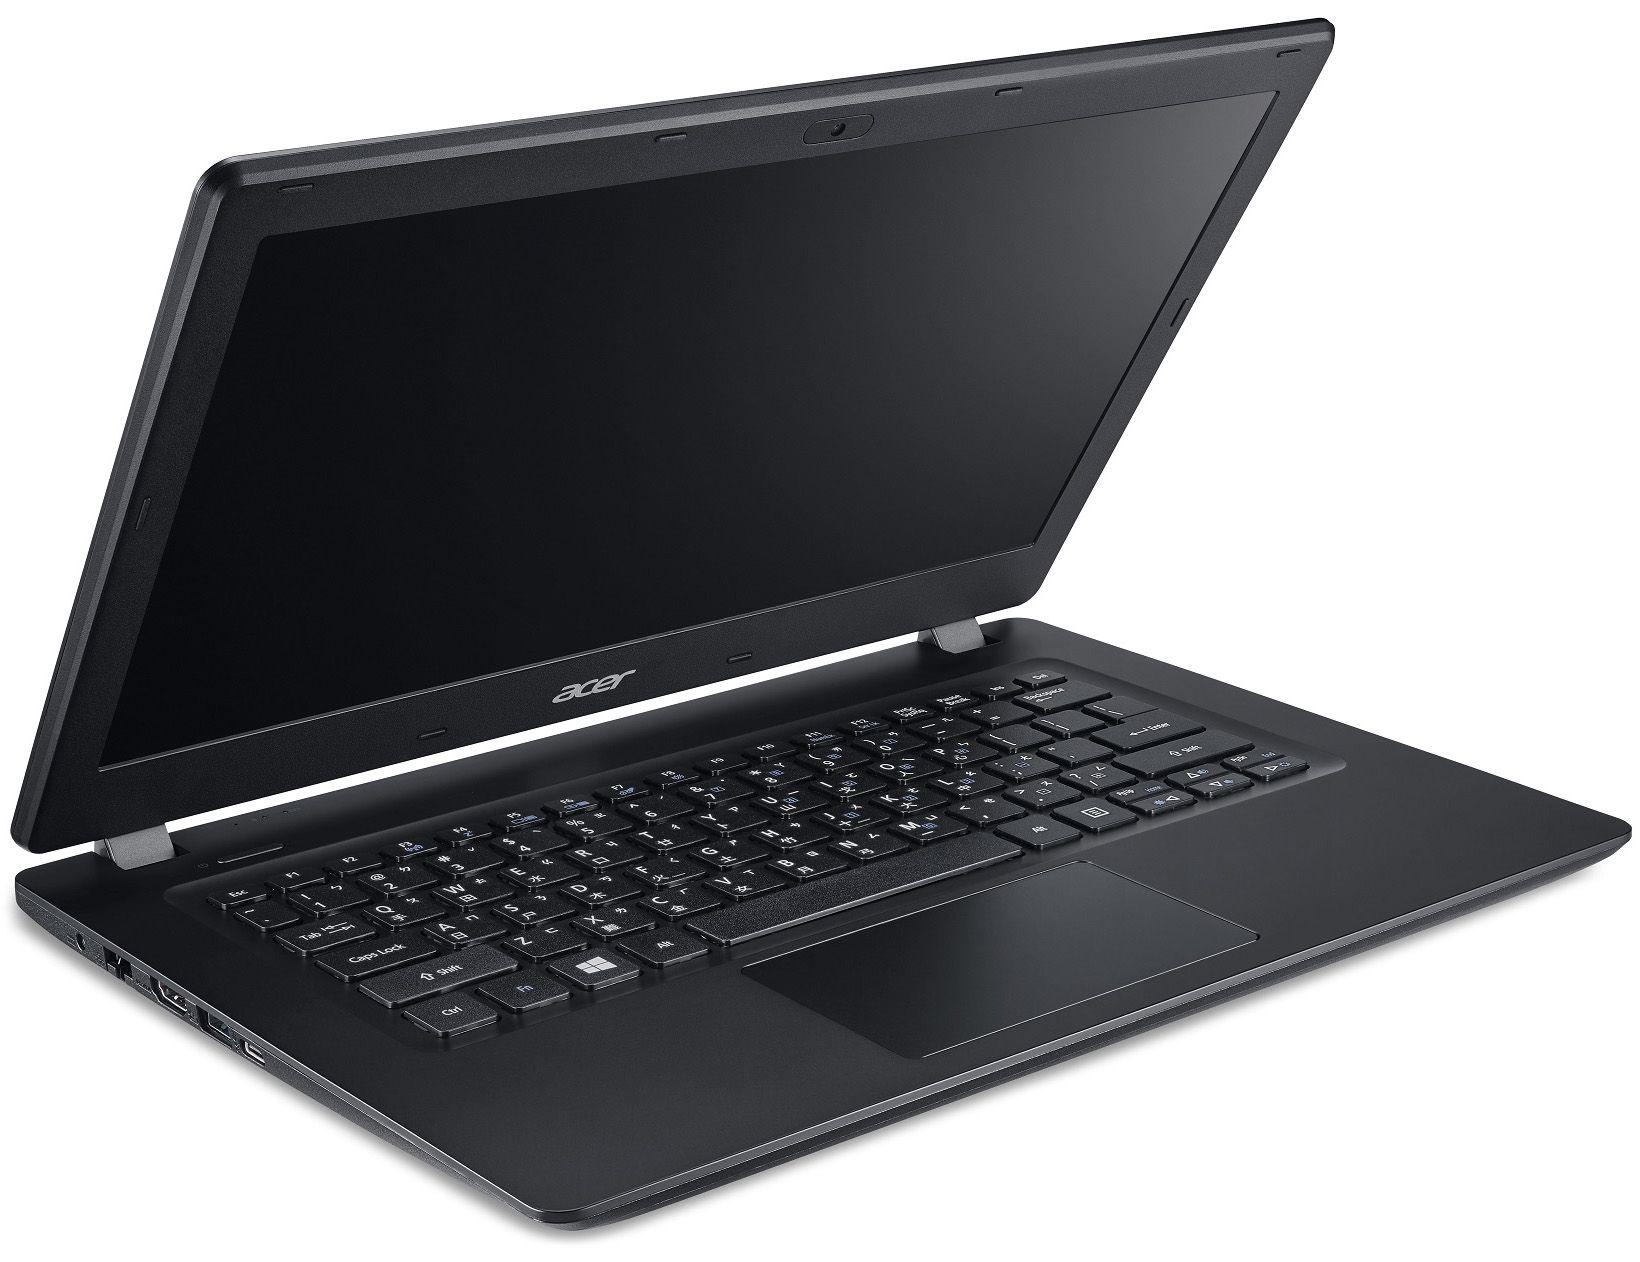 Лаптоп Acer TravelMate P238-M - 2